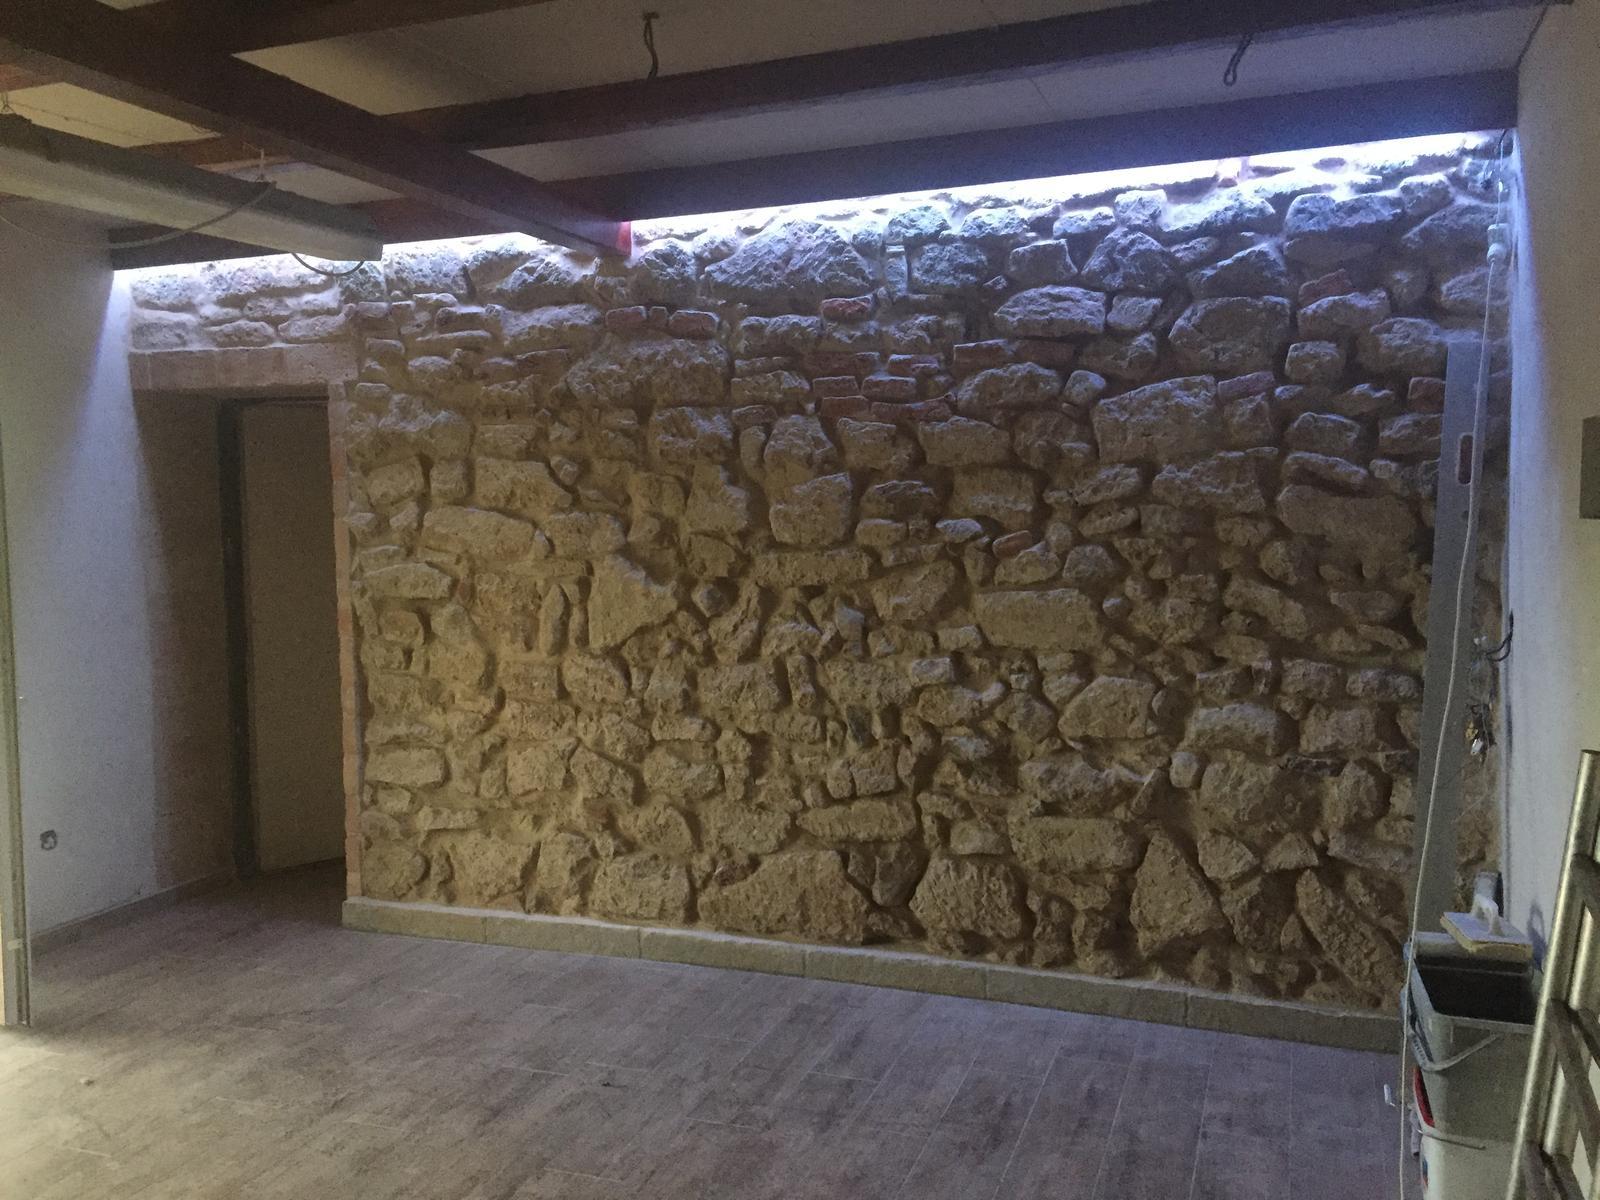 HACIENDA NAPOLI SEBECHLEBY - Nanovo urobene podsvietenie kamennej steny